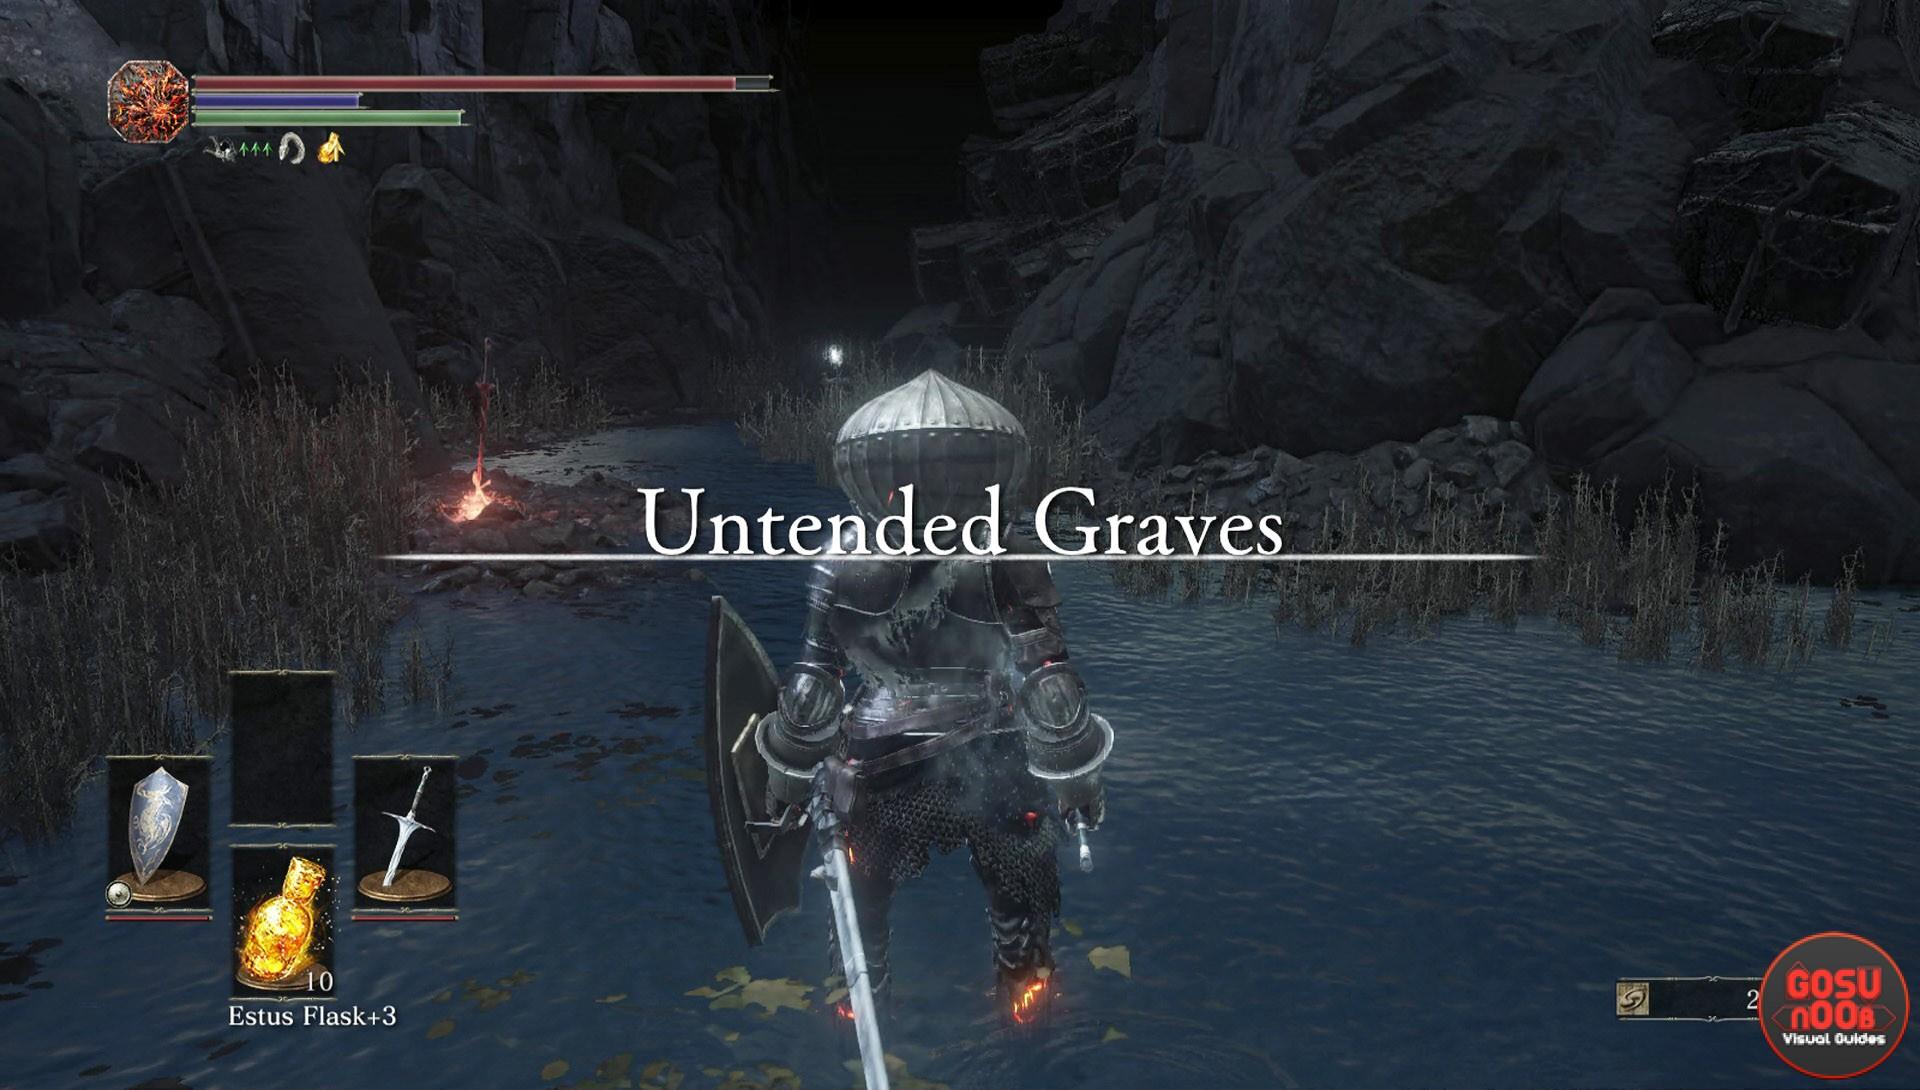 Untended Graves Secret Area Dark Souls 3 Gosu Noob